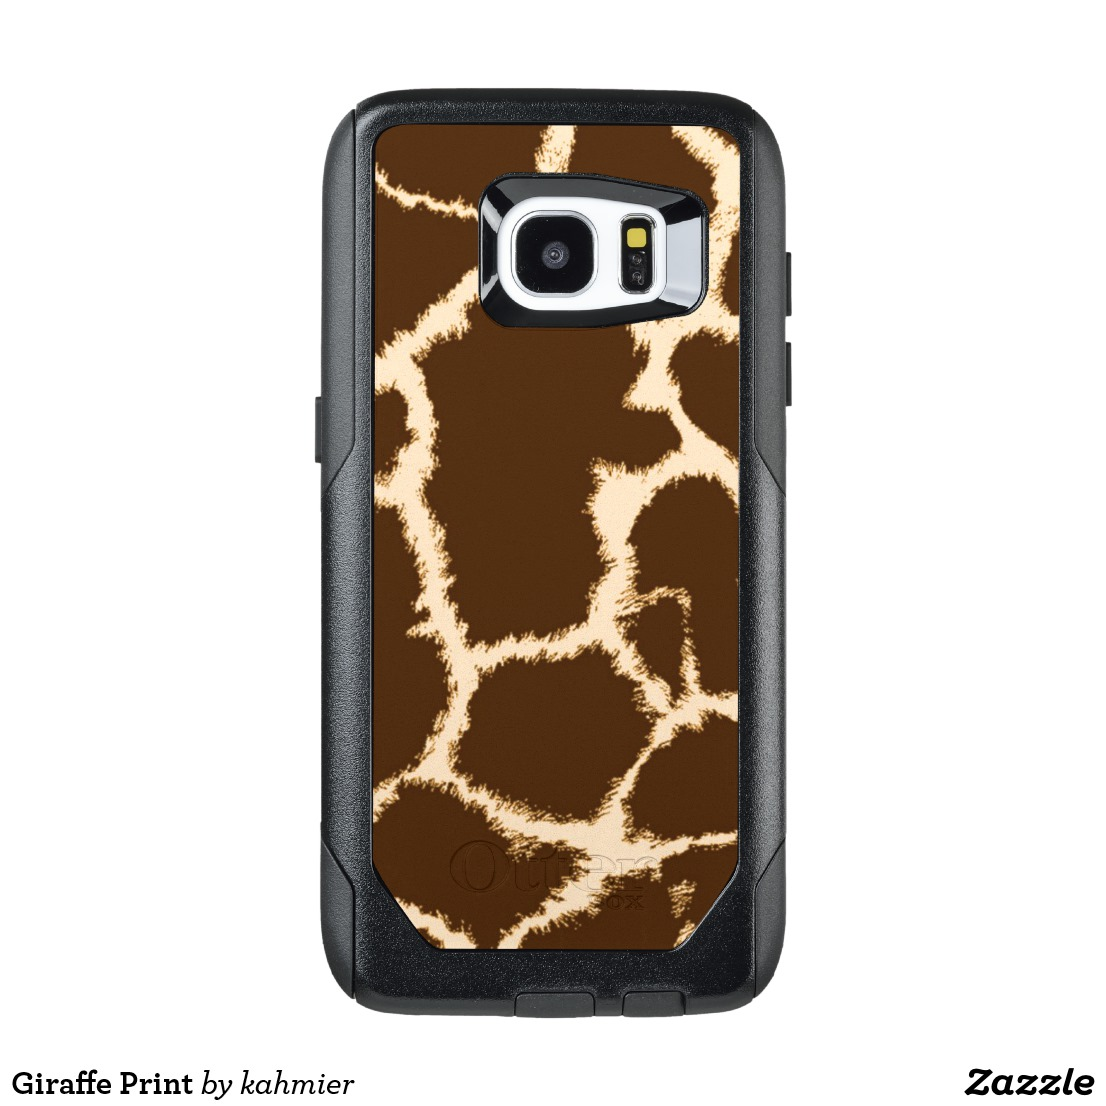 Giraffe Print OtterBox Samsung Galaxy S7 Edge Case